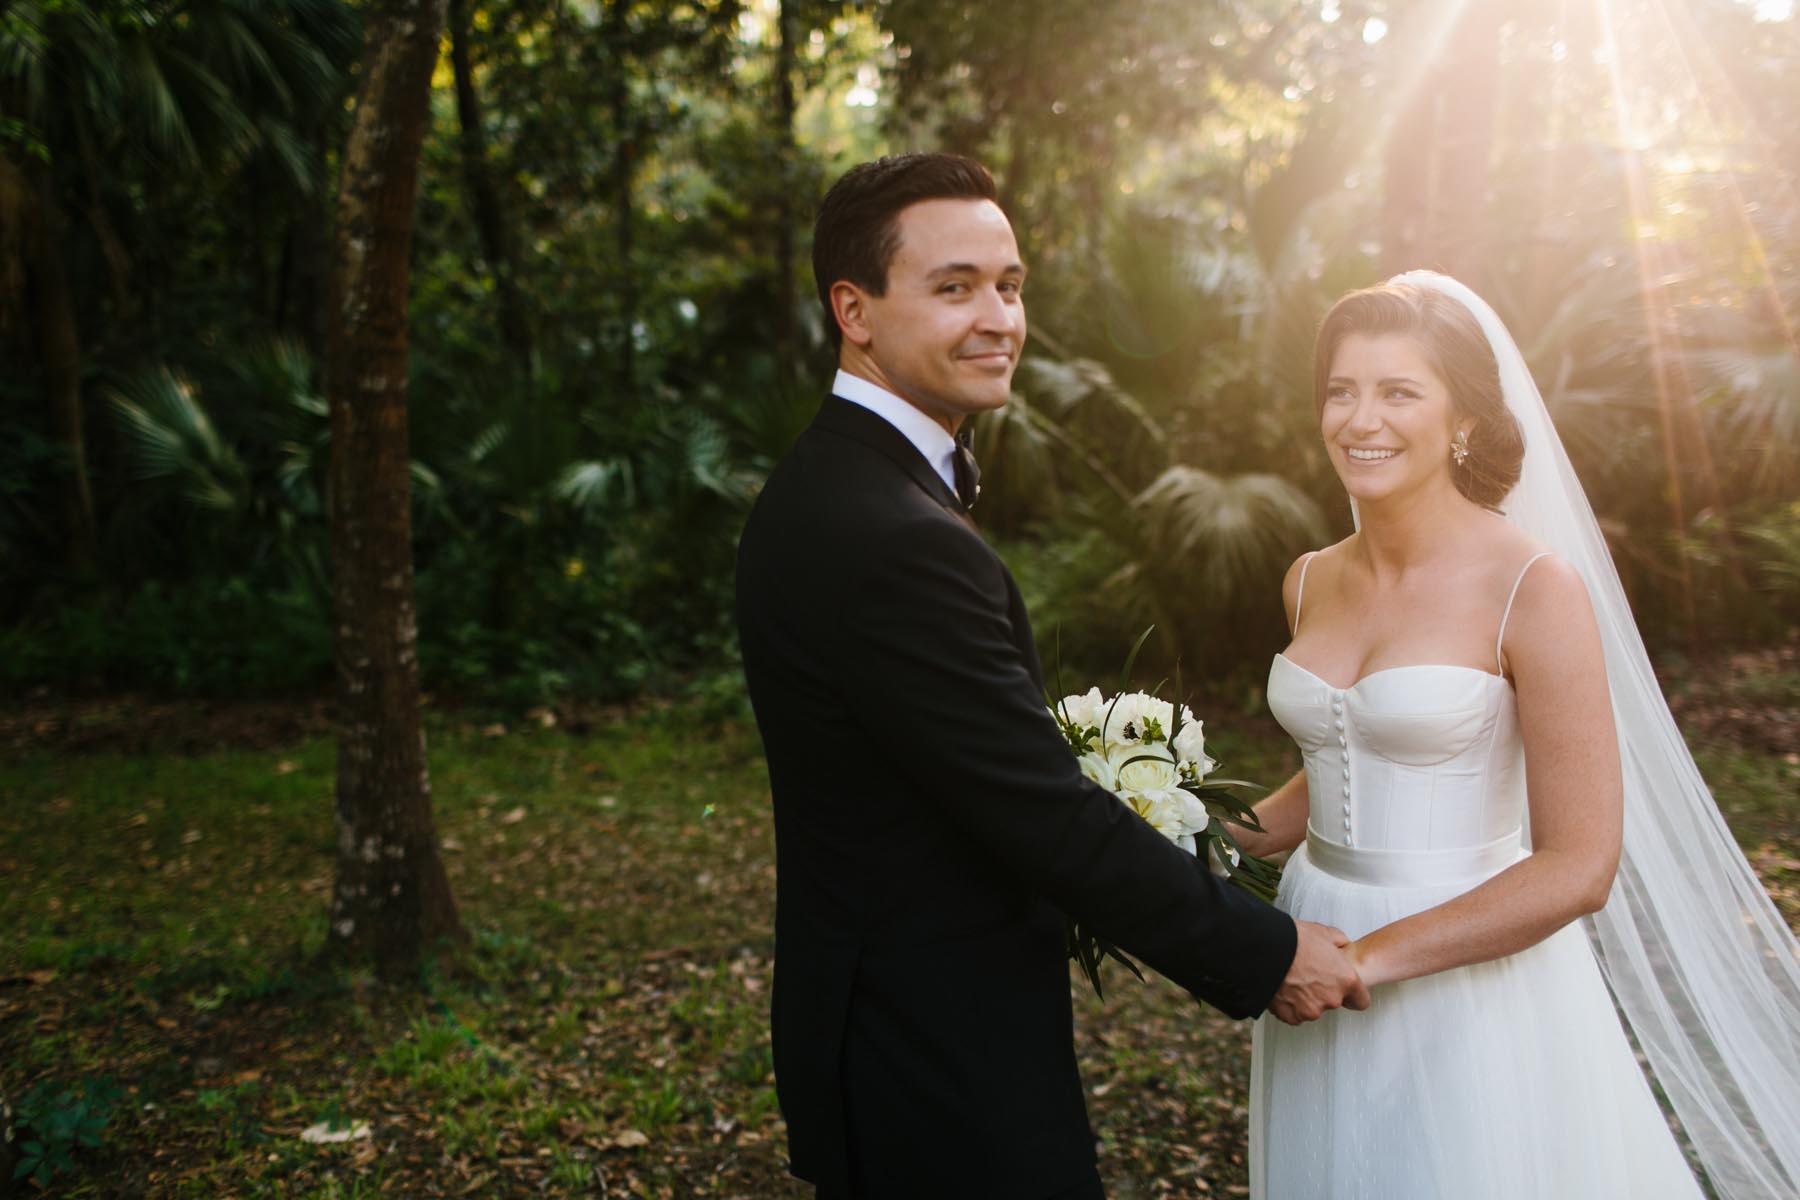 lowry wedding blog eden garden florida wedding-85